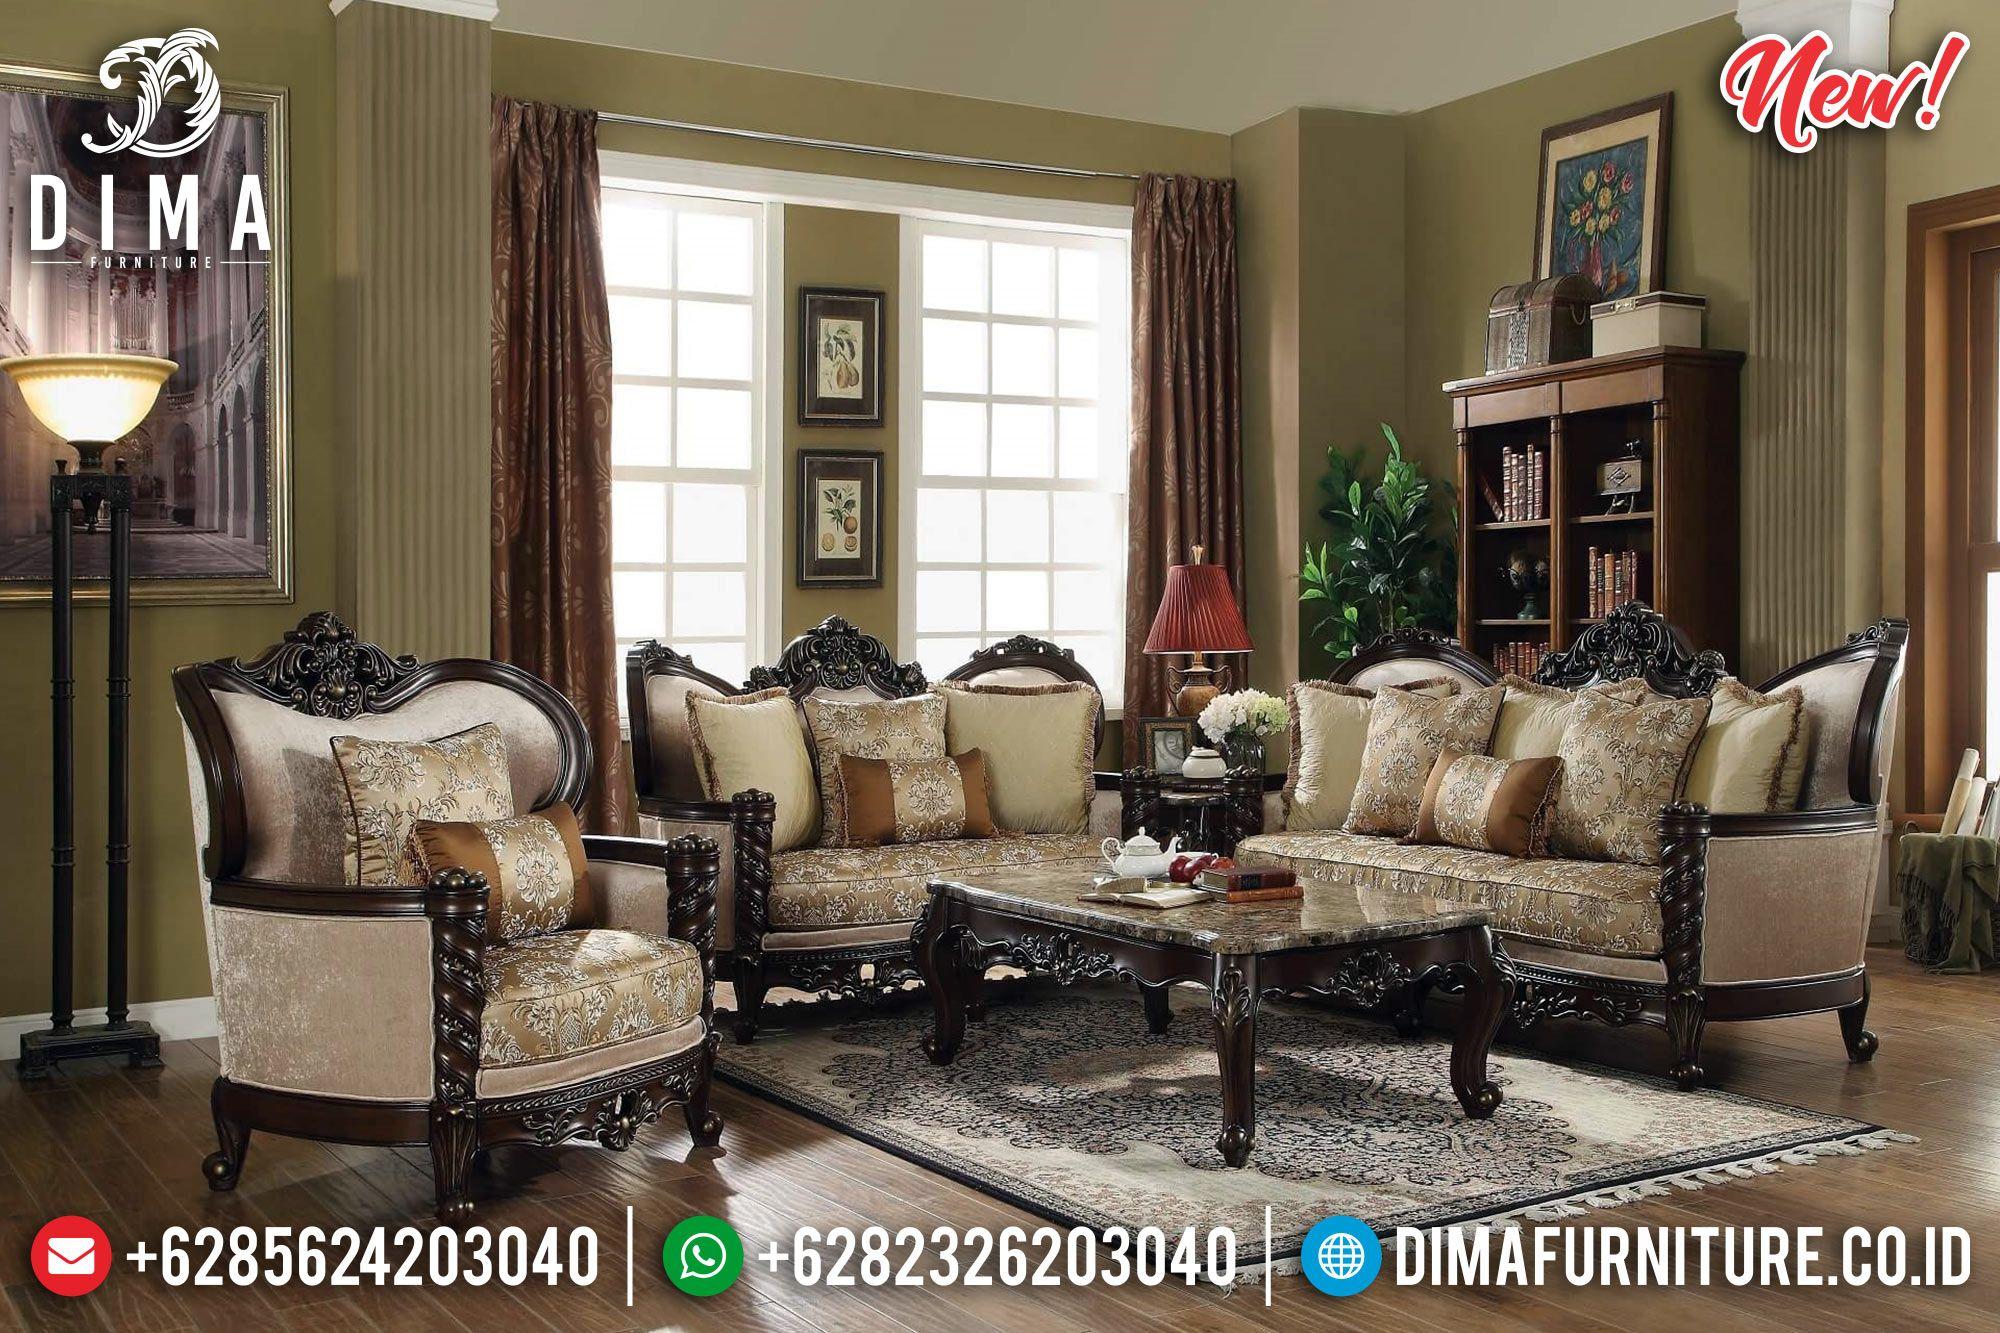 Kursi Ukiran Terbaru Sofa Tamu Mewah Jati Bt 0202 Set Ruang Keluarga Ruang Keluarga Kecil Furnitur Ruang Keluarga #sofa #set #small #living #room